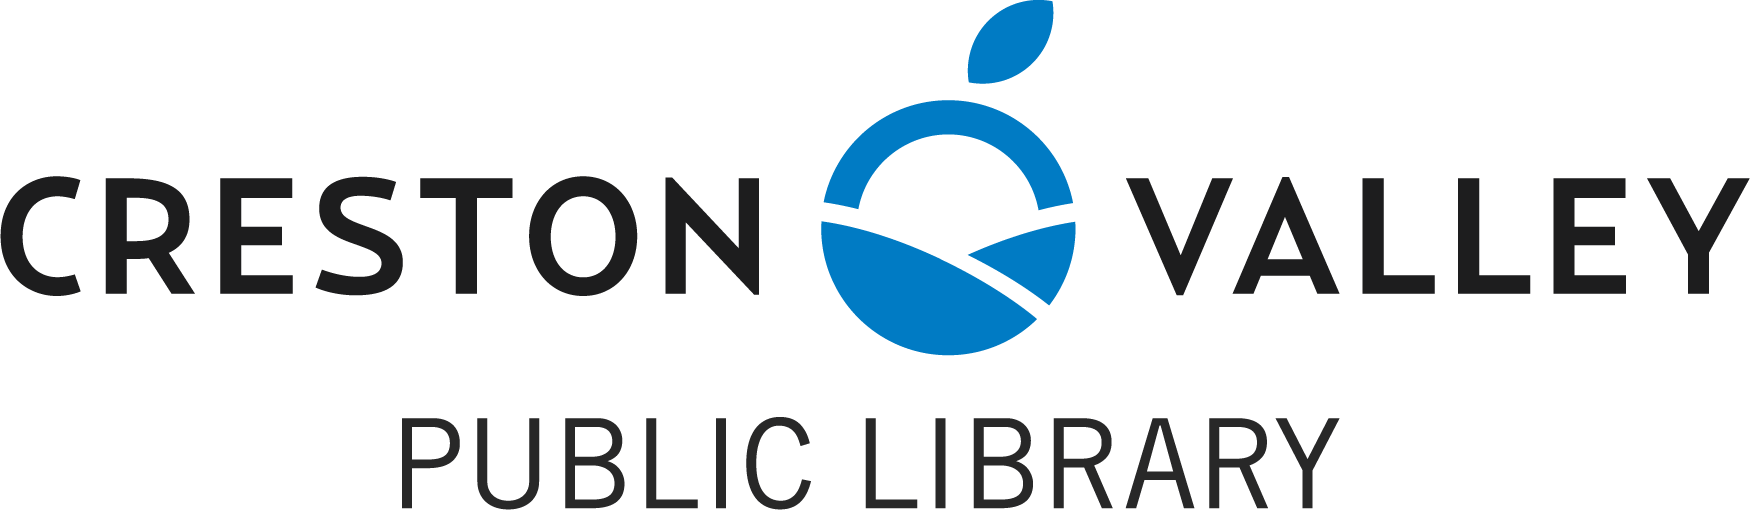 Creston Logo